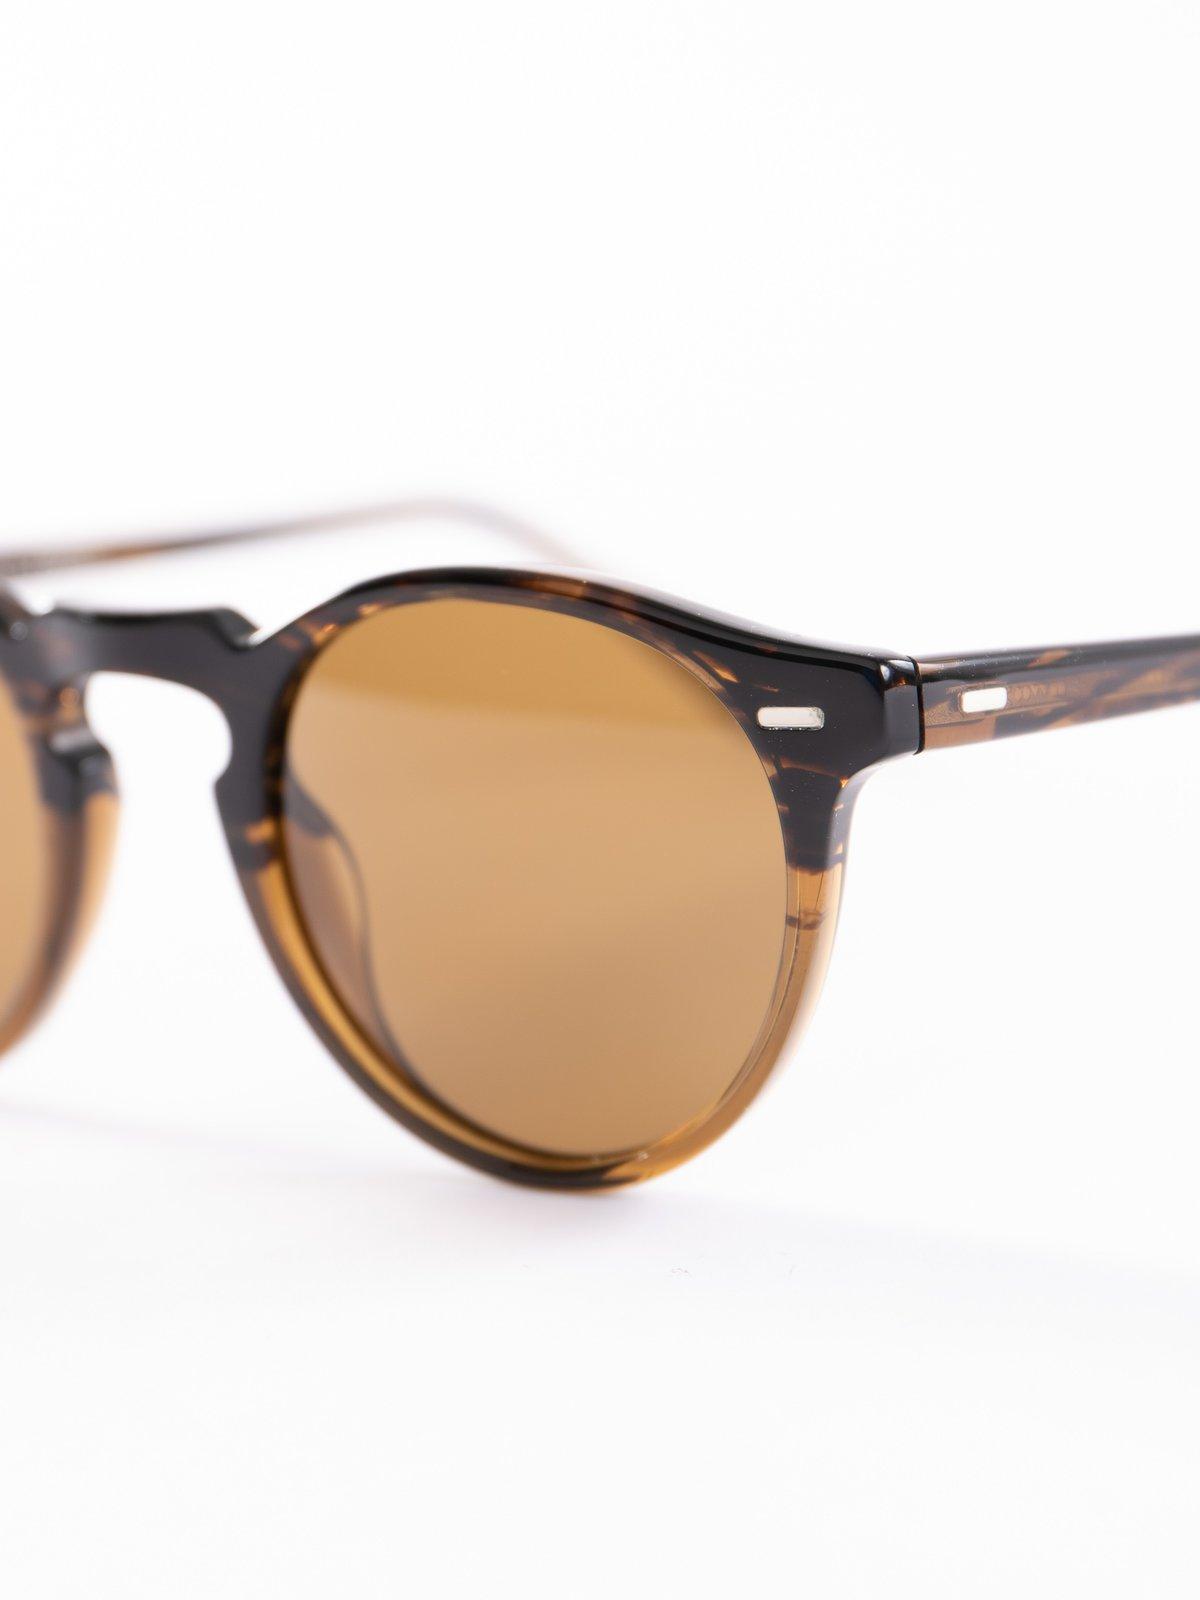 Tortoise/Brown Gregory Peck Sunglasses - Image 3